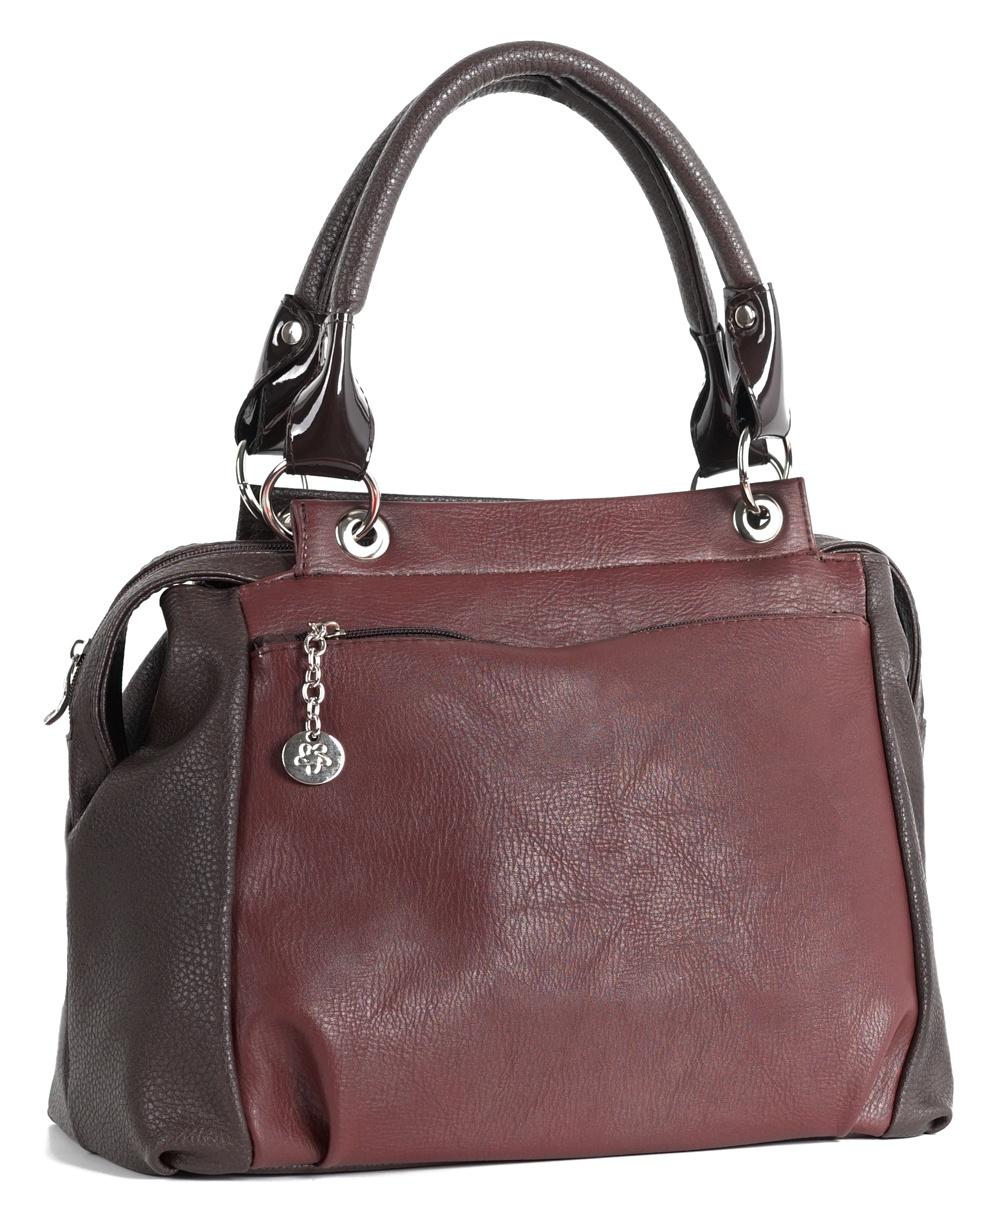 Сумка VITA, VITA-Art KKD 8127-315, коричнево-красный сумка vita vita mp002xw0no4b